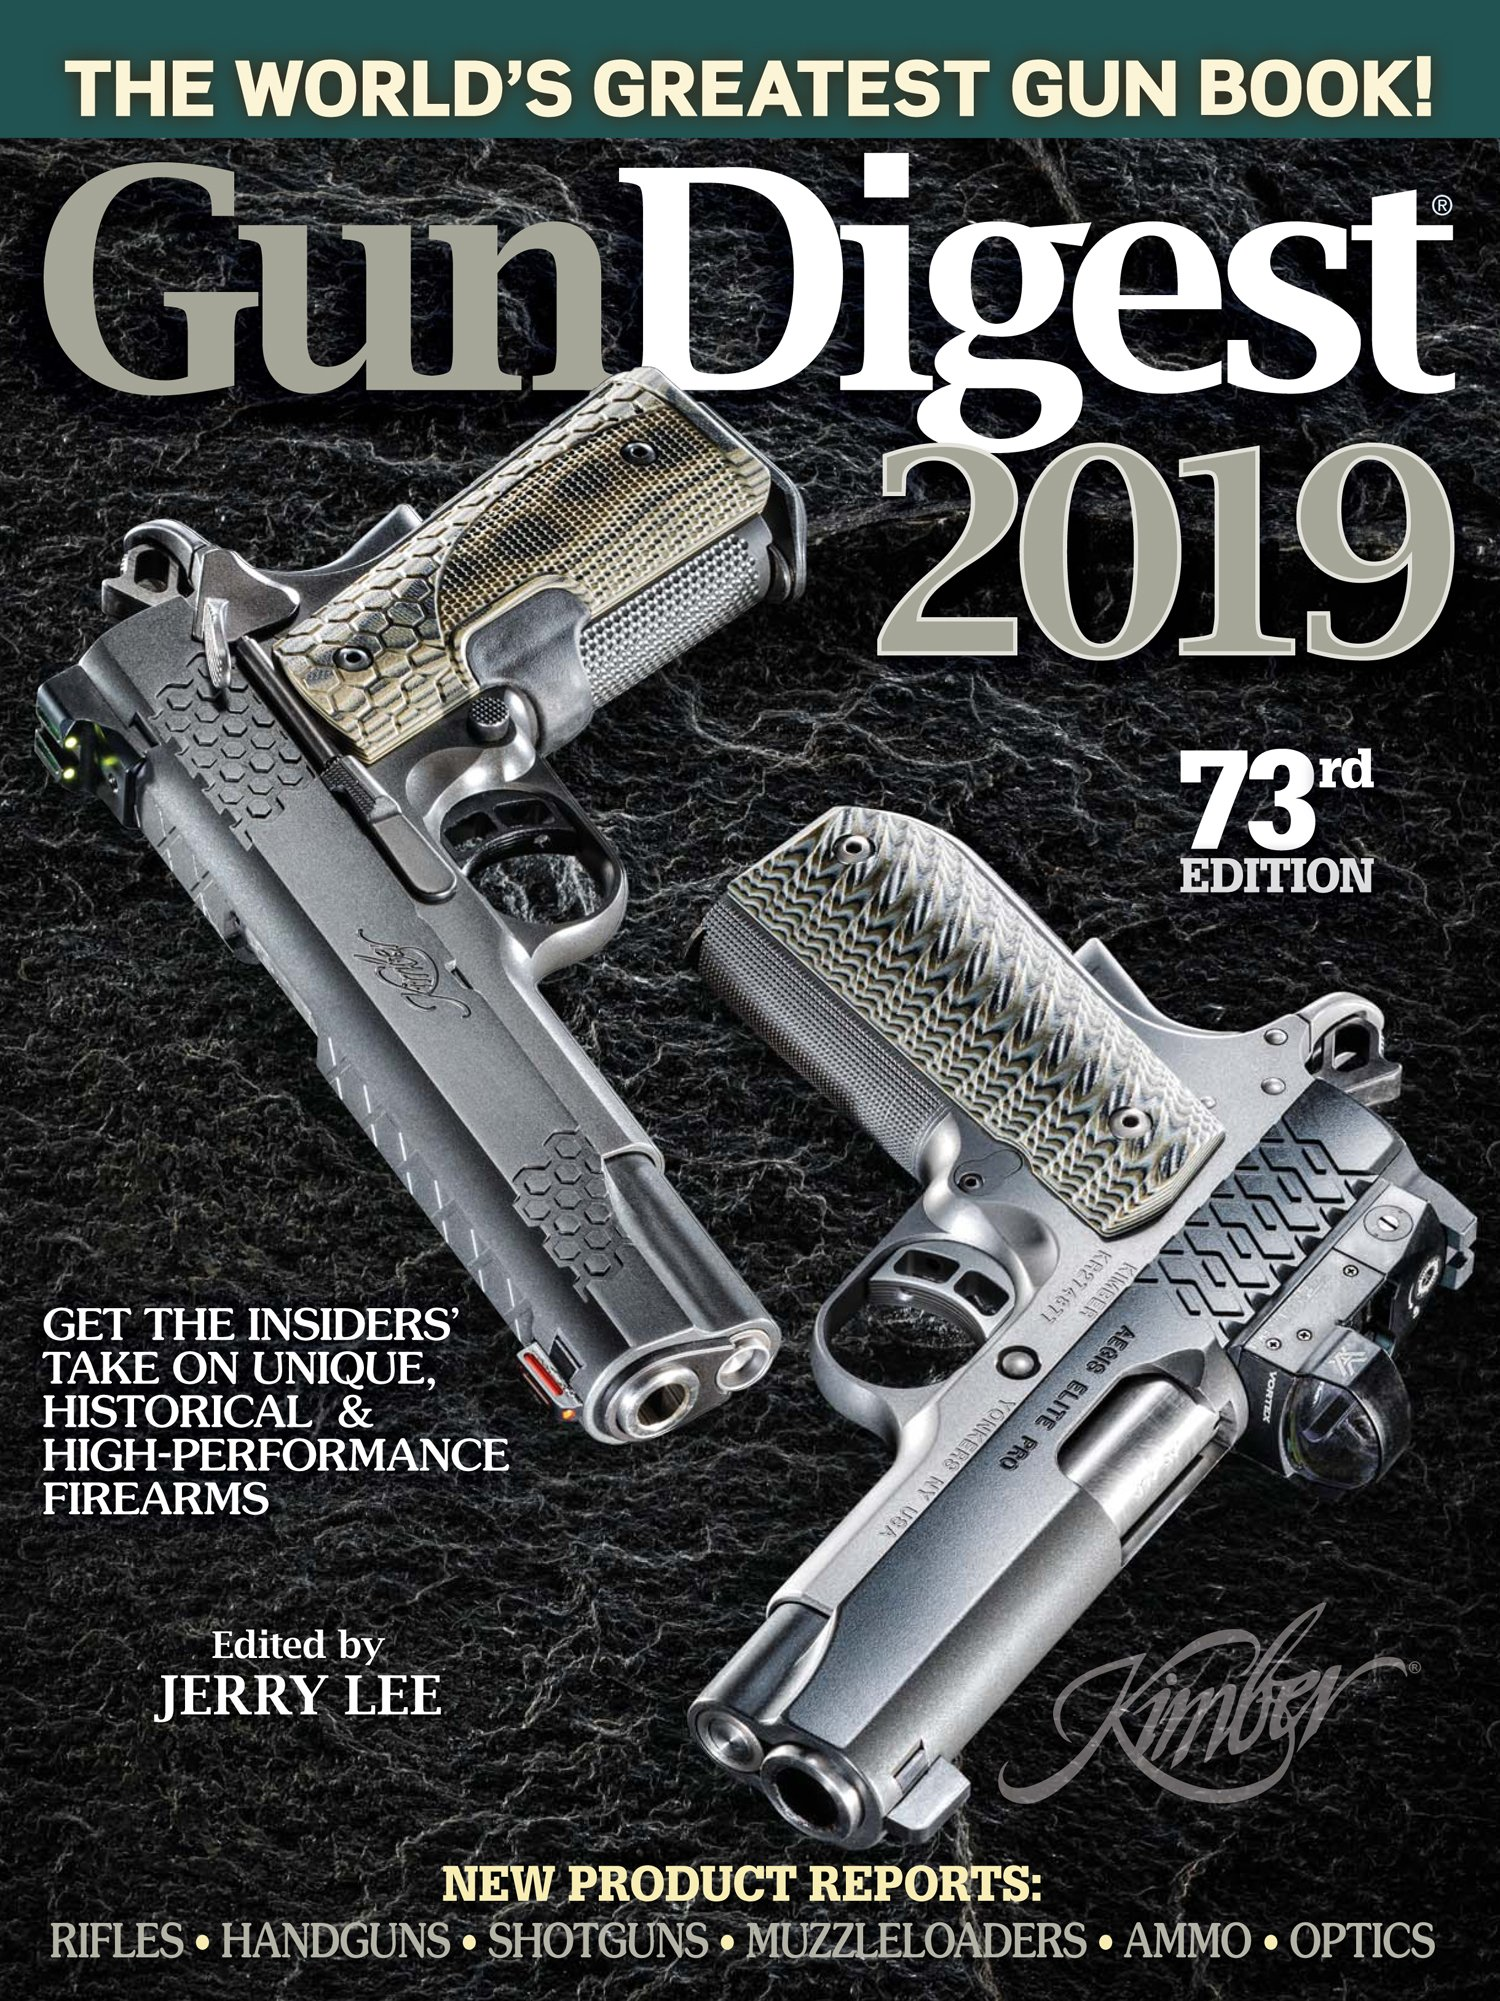 Gun Digest 2019, 73rd Edition: The World's Greatest Gun Book!